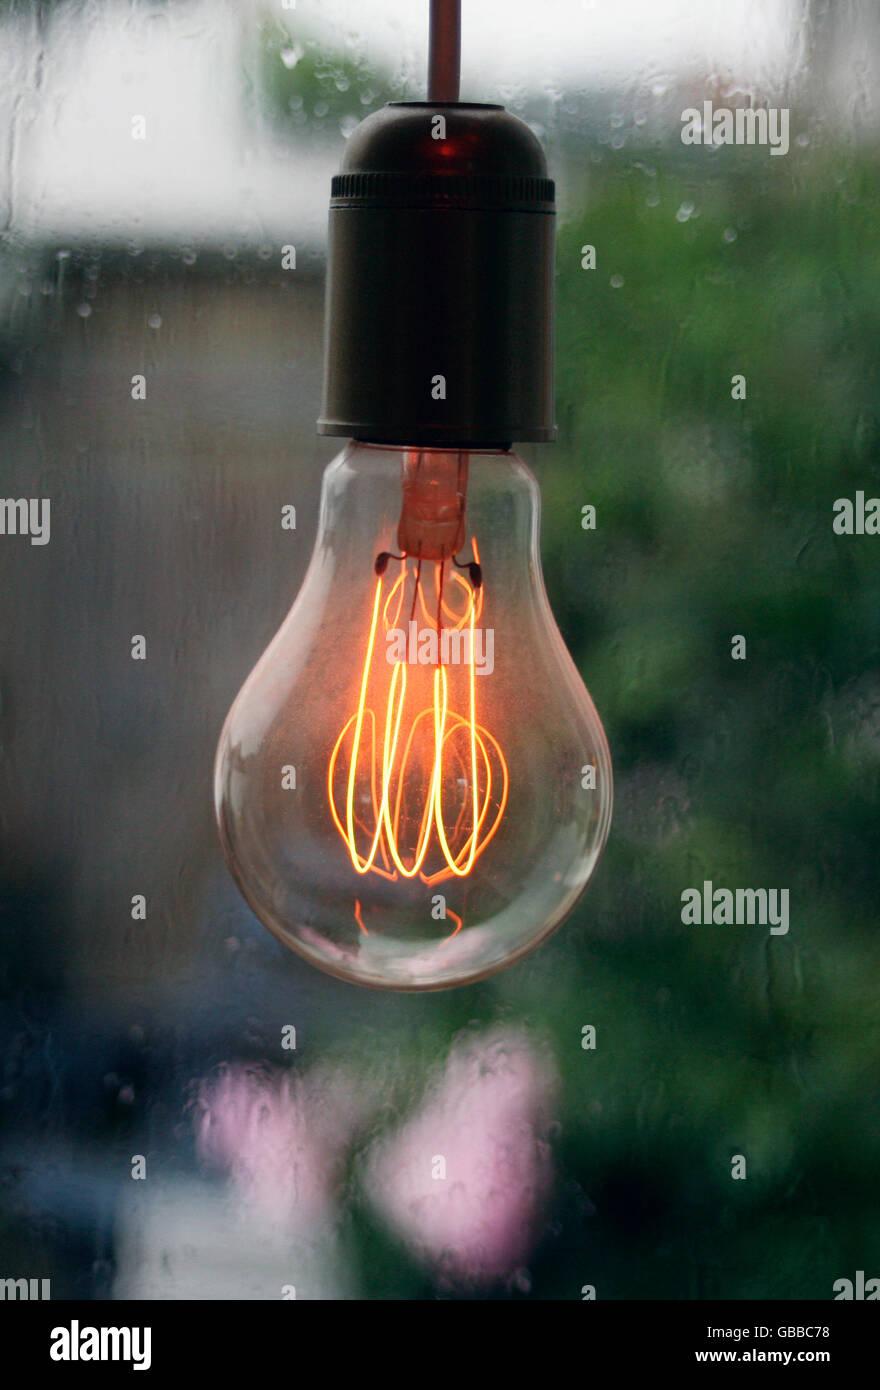 Filamentos de lámparas incandescentes. Imagen De Stock